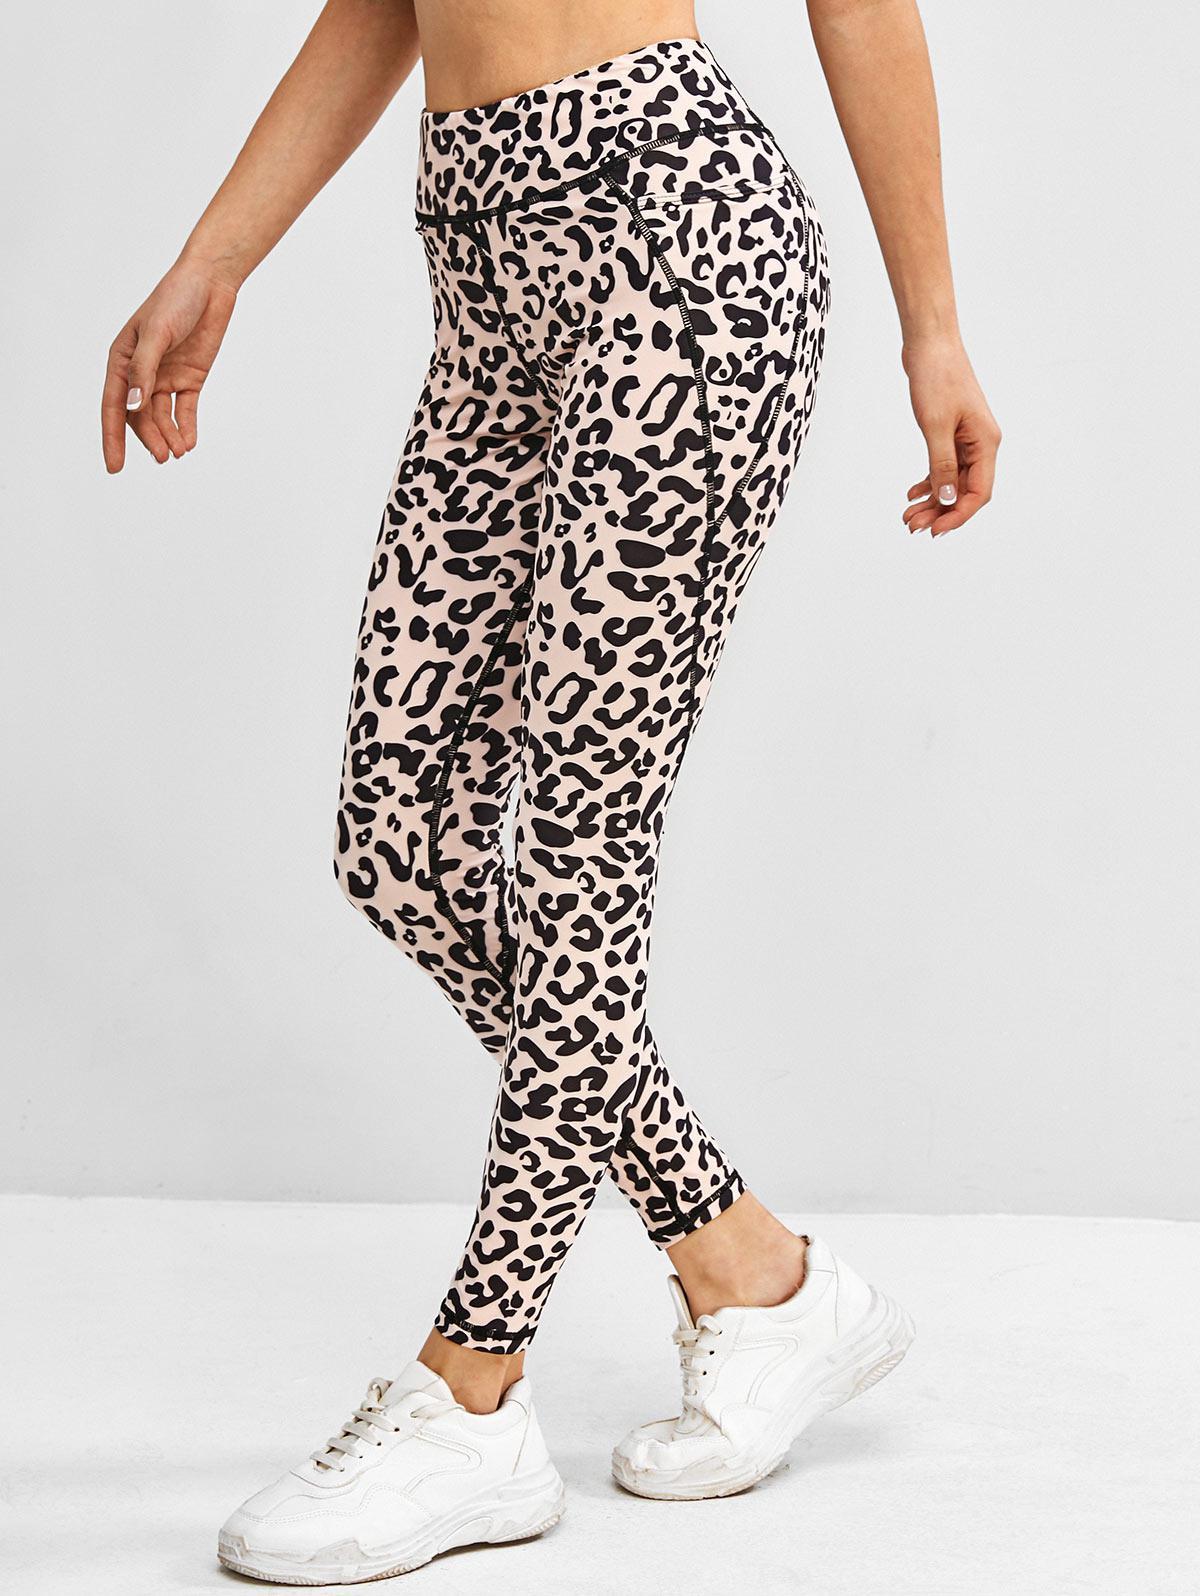 Leopard Topstitch Pocket High Rise Gym Leggings